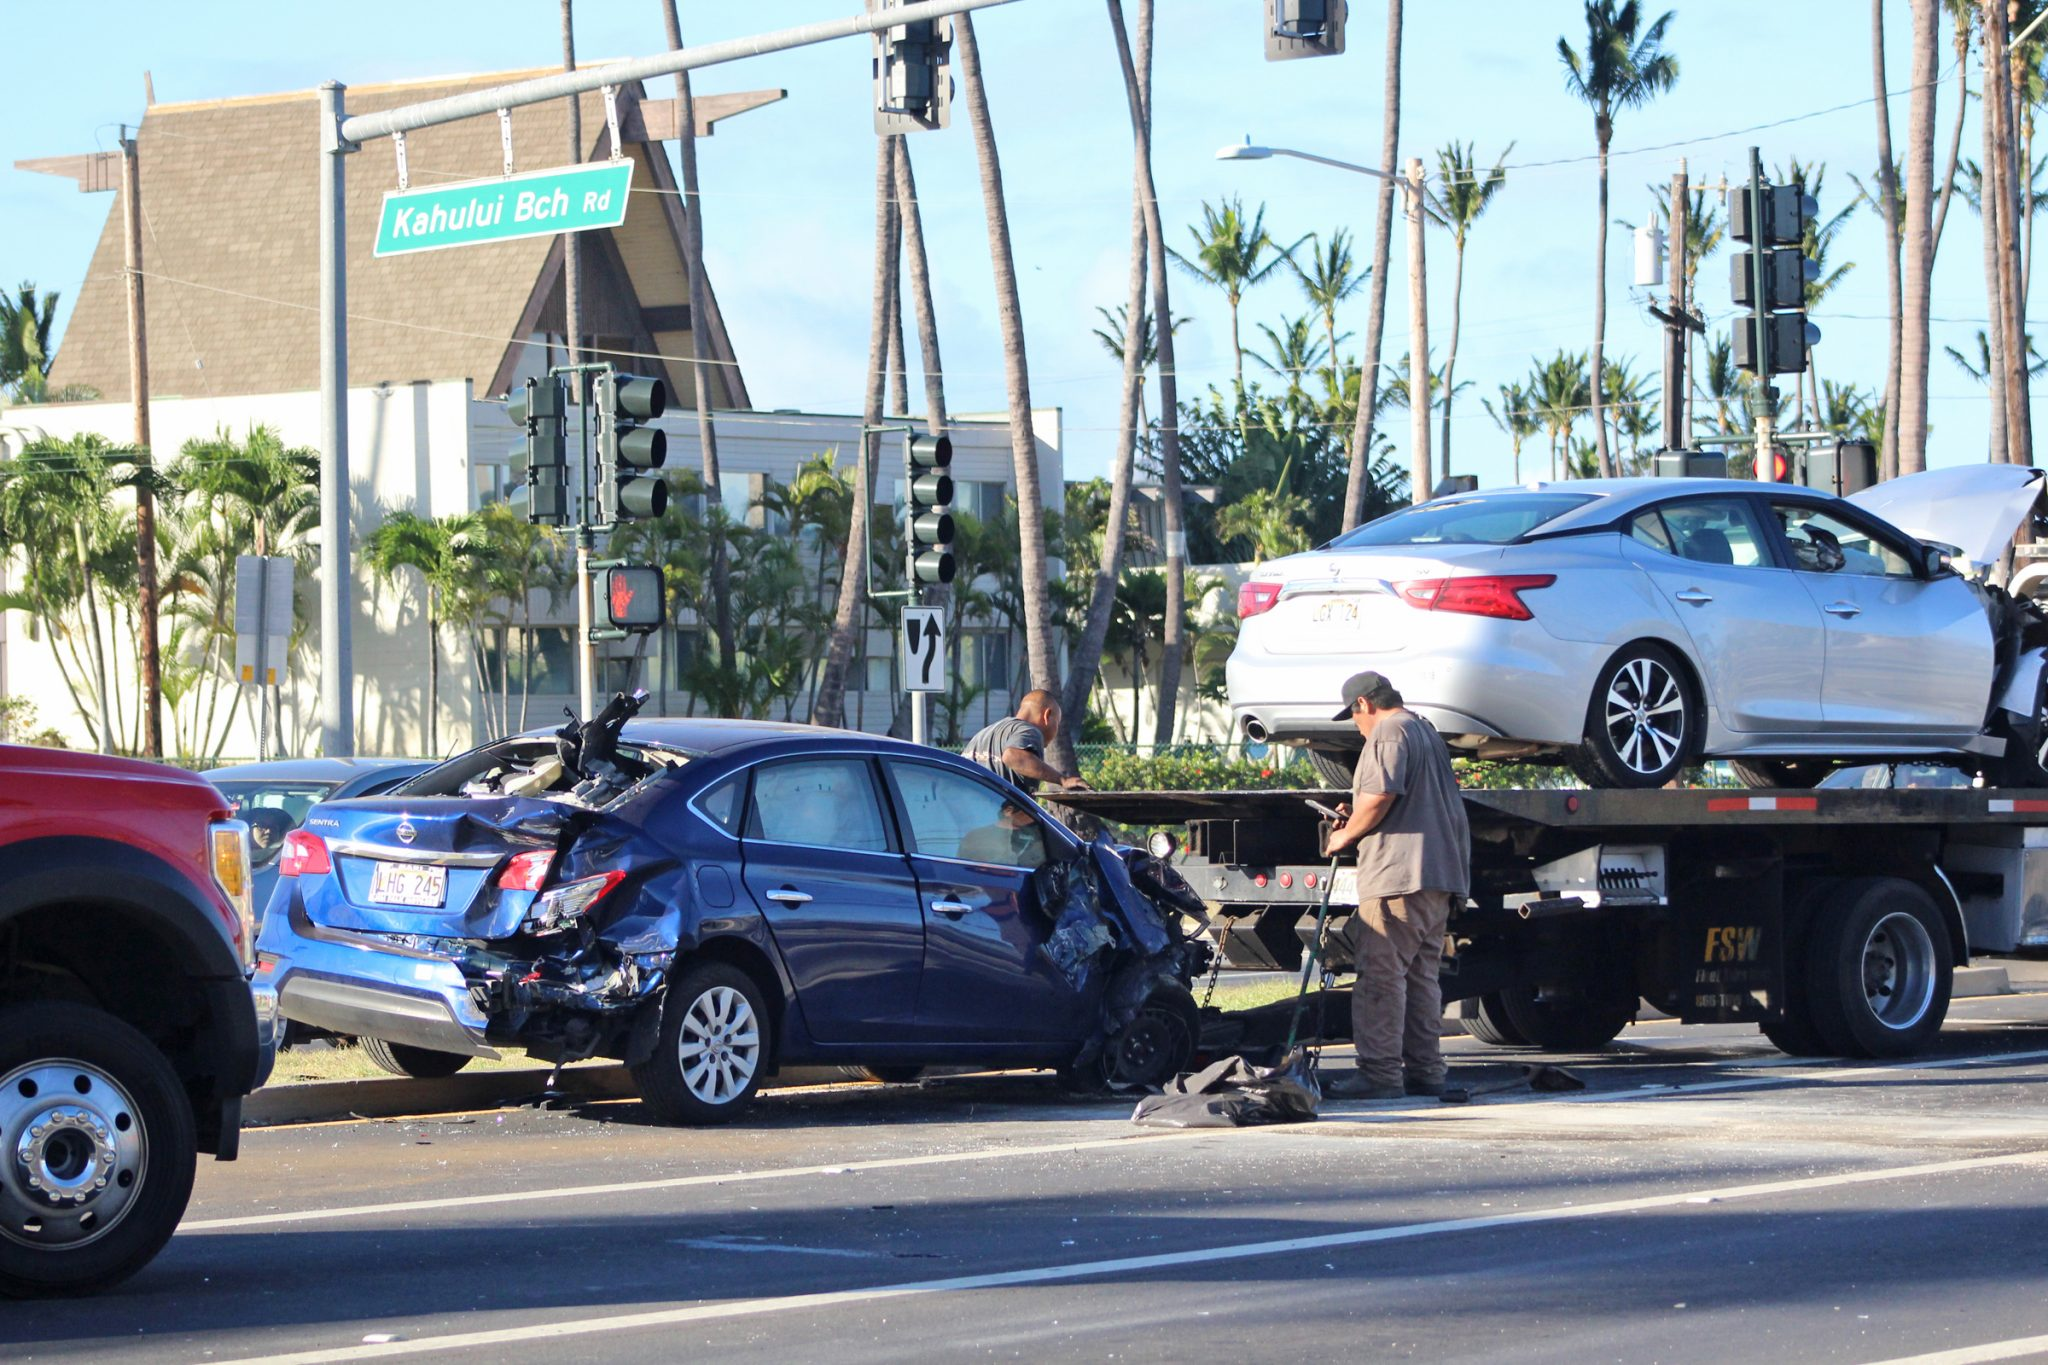 Multiple Car Accident In Kahului News Sports Jobs Maui News